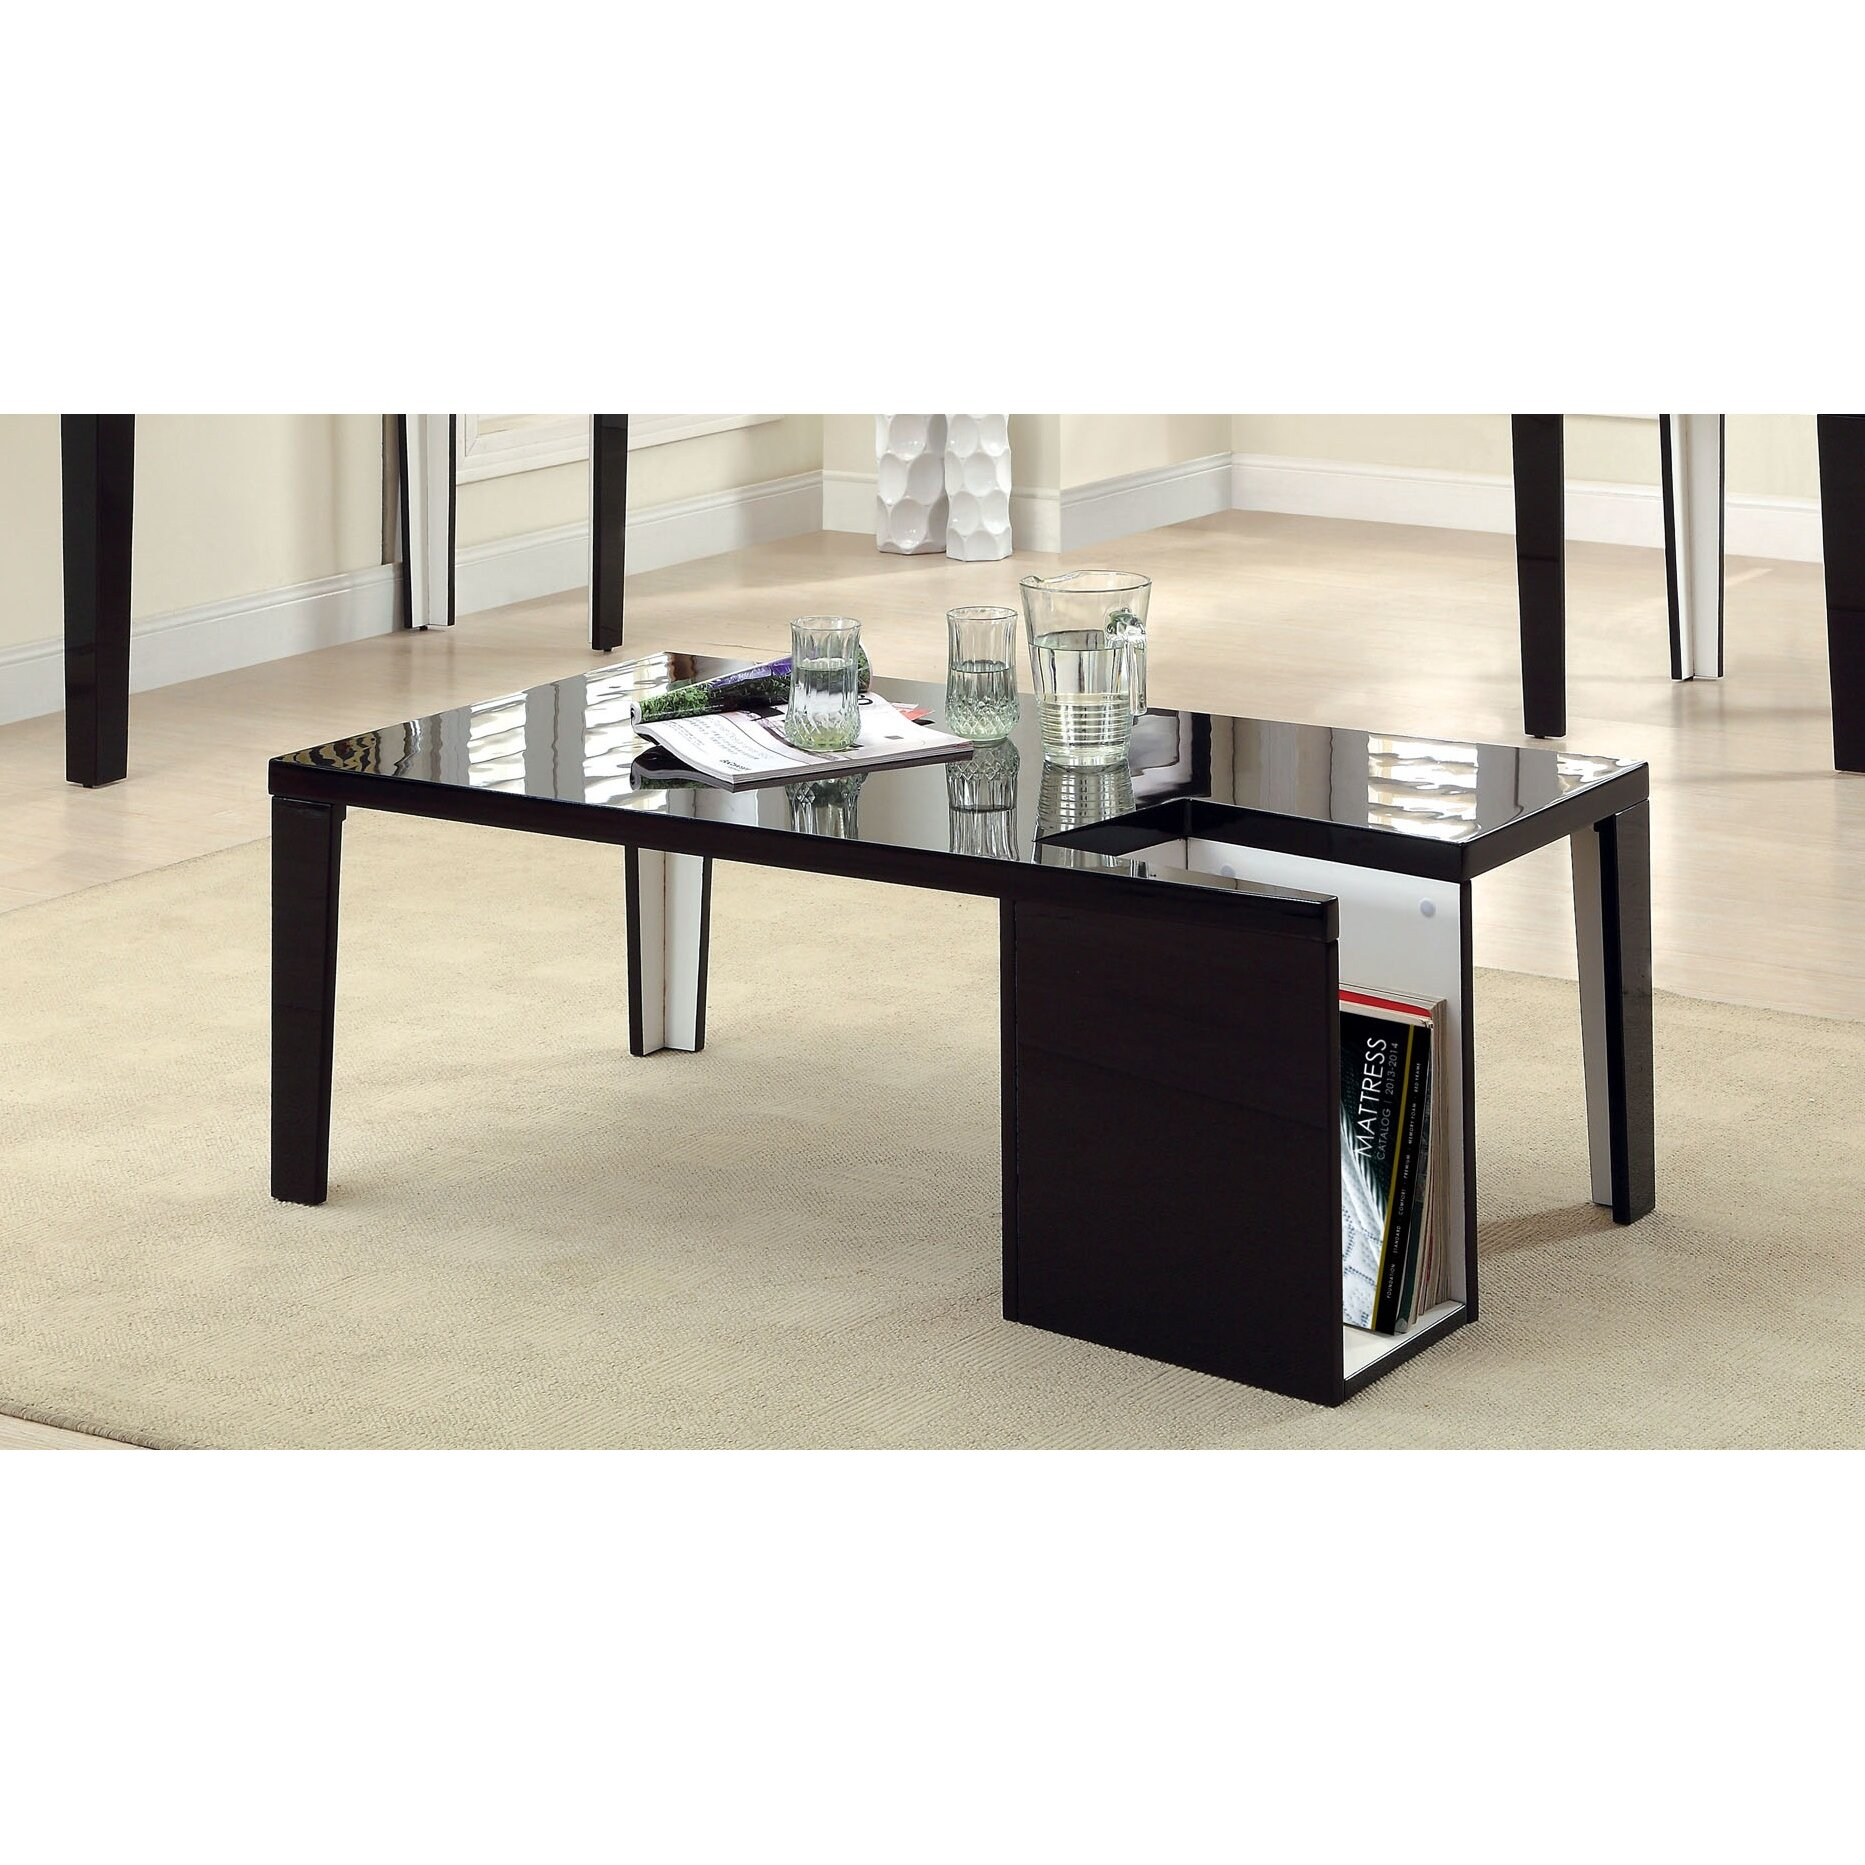 Hokku Designs Zedd Coffee Table With Magazine Rack Reviews Wayfair